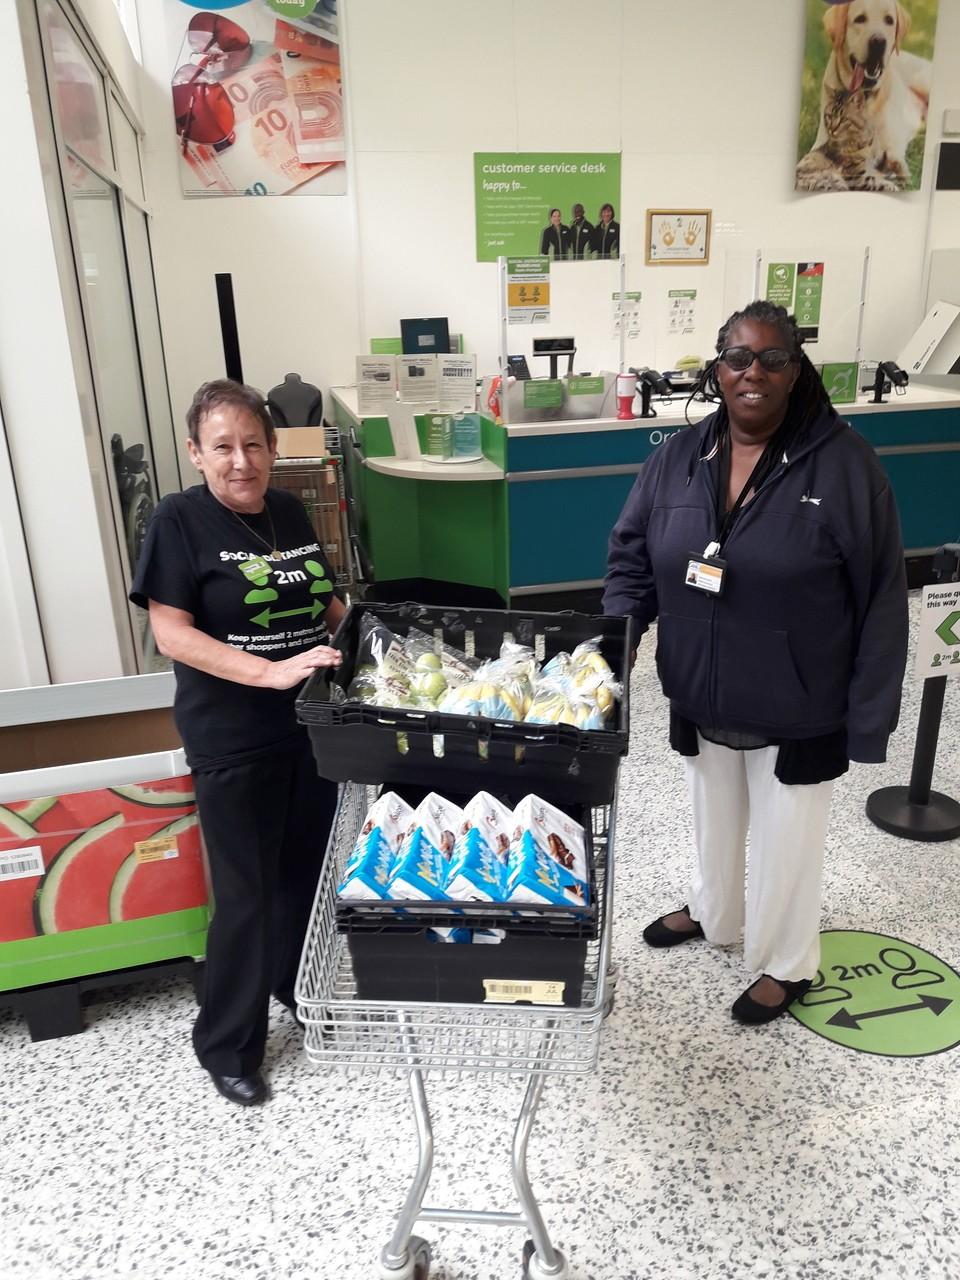 Donation to The Good Shepherd Ministry | Asda Wolverhampton